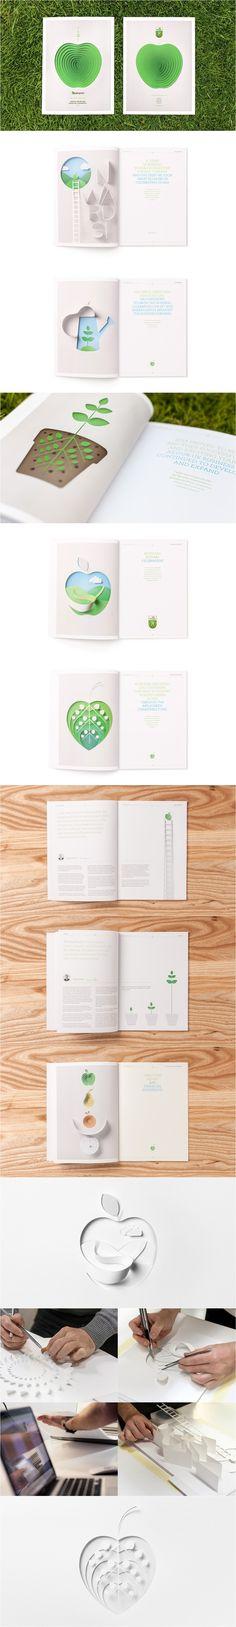 Memoria Anual Corporativa Applegreen by Biográfica